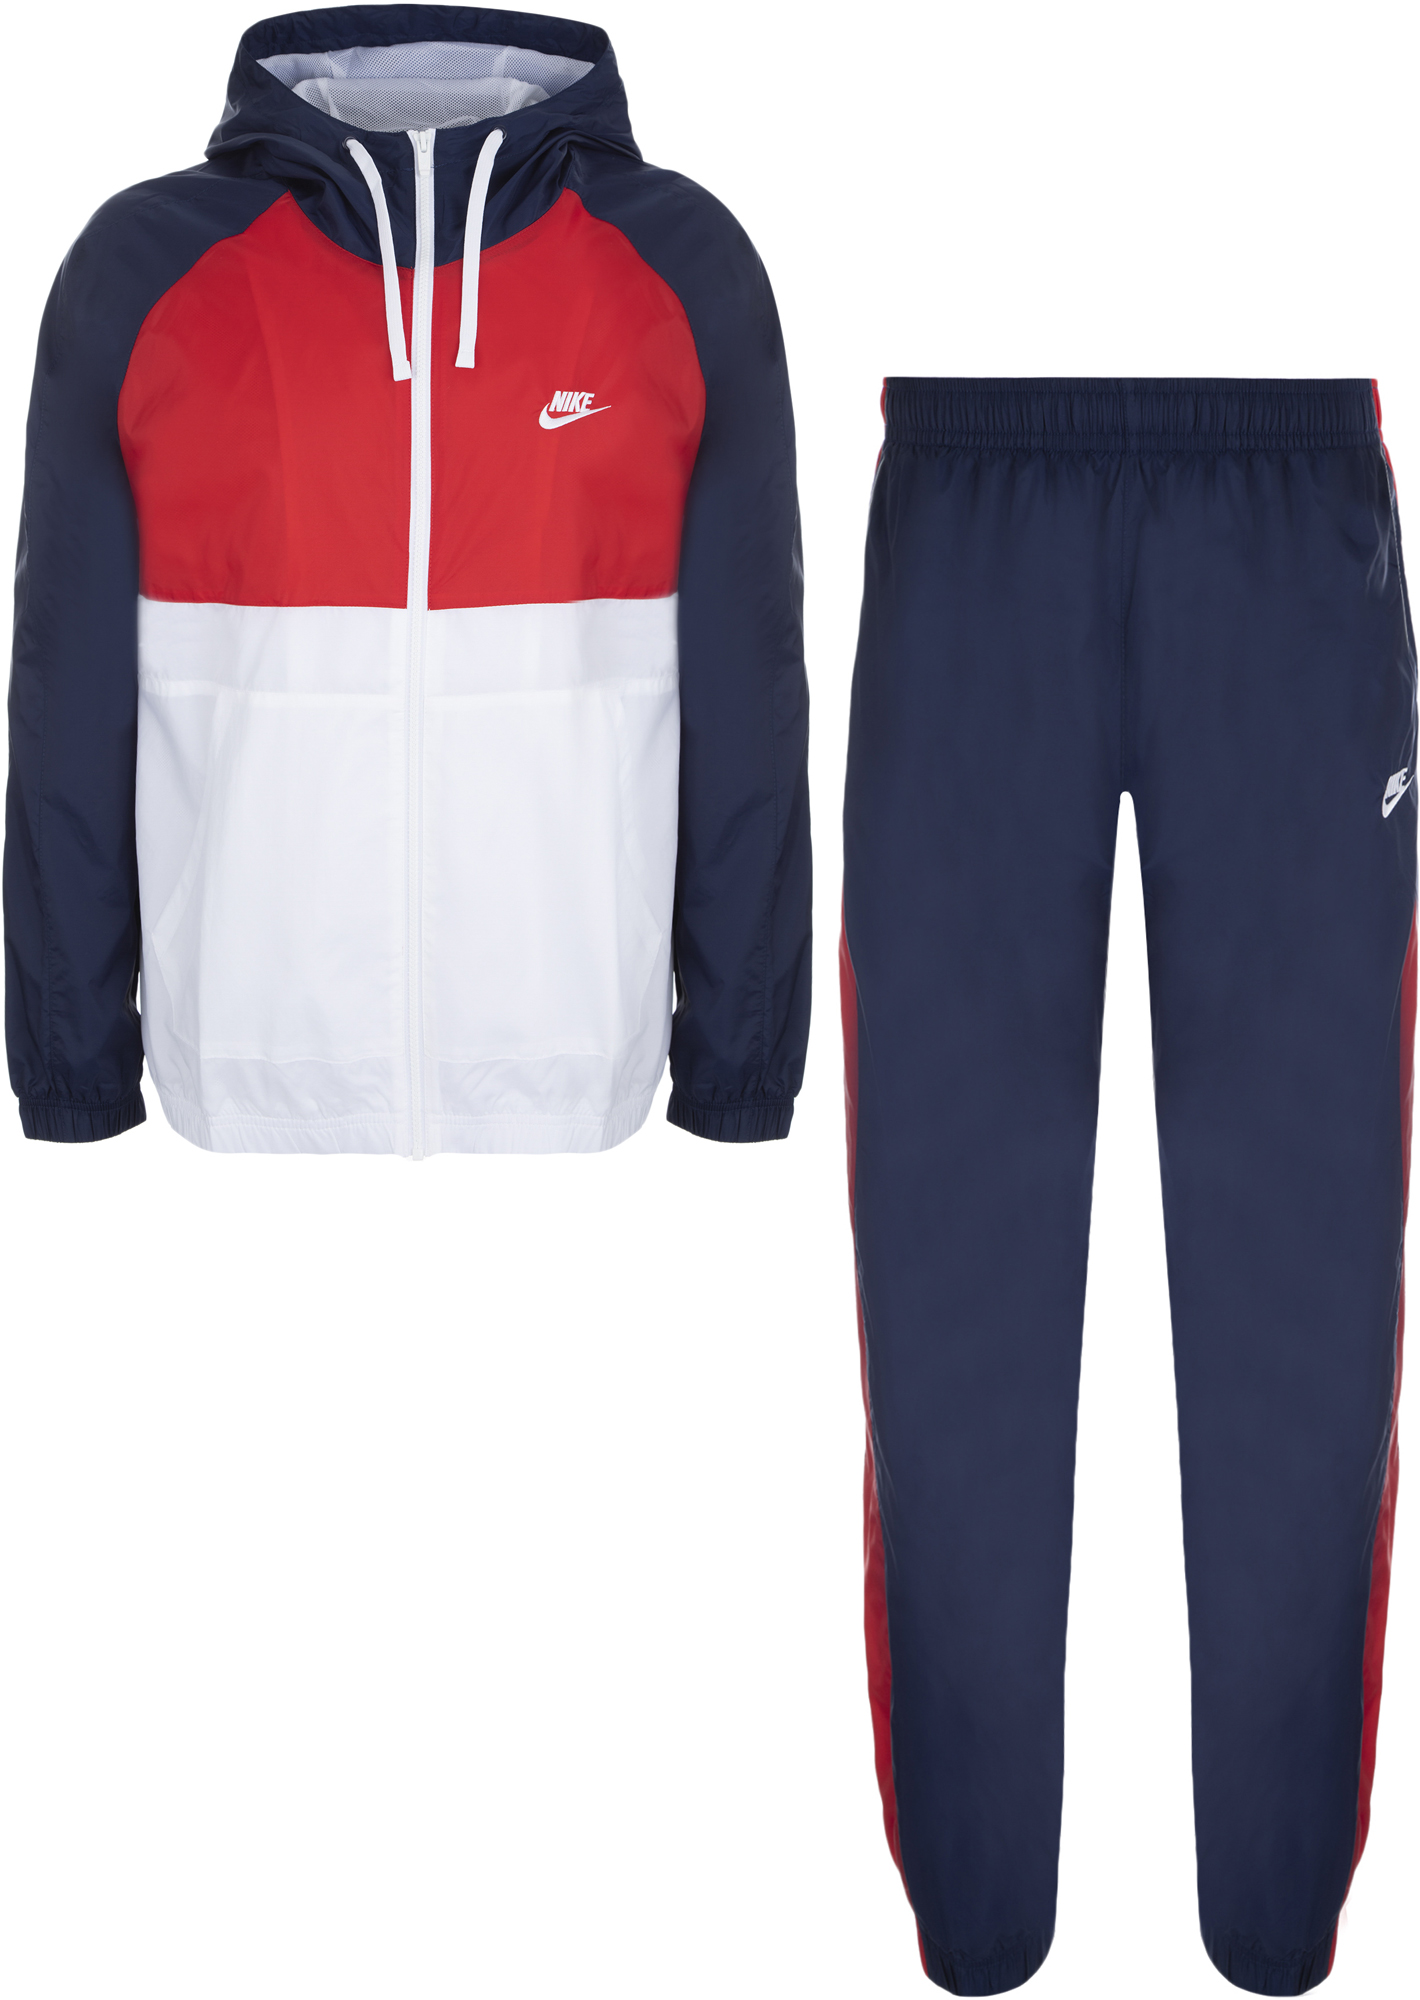 Nike Спортивный костюм мужской Nike, размер 52-54 цена